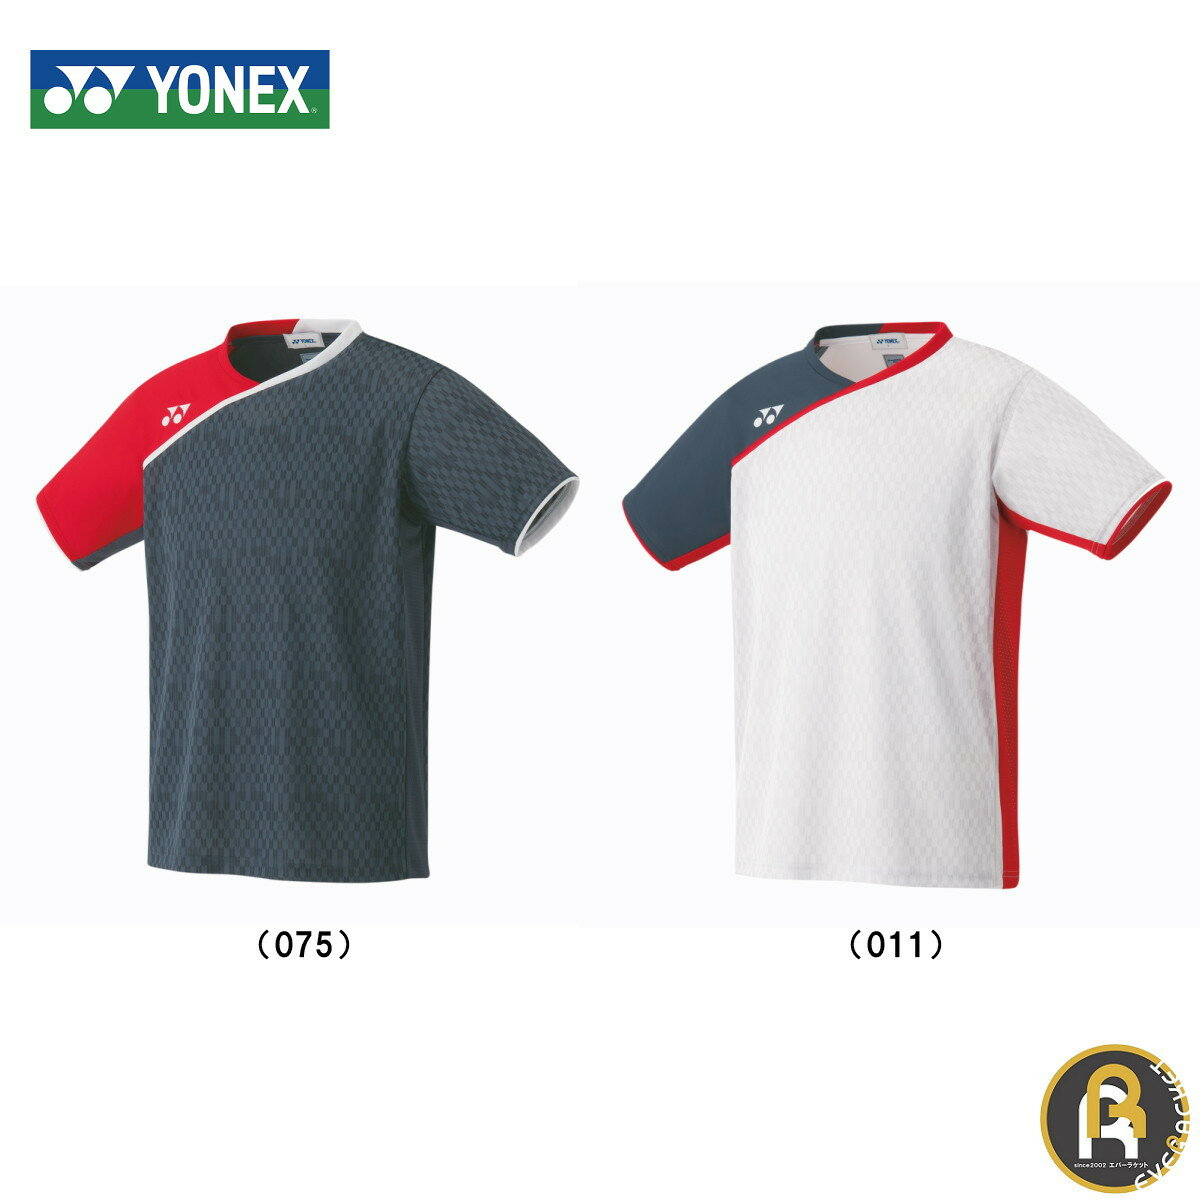 fb430dc3b9e55 YONEX ヨネックス バドミントン テニス ソフトテニス ウエア メンズゲームシャツ(フィットスタイル) 10260